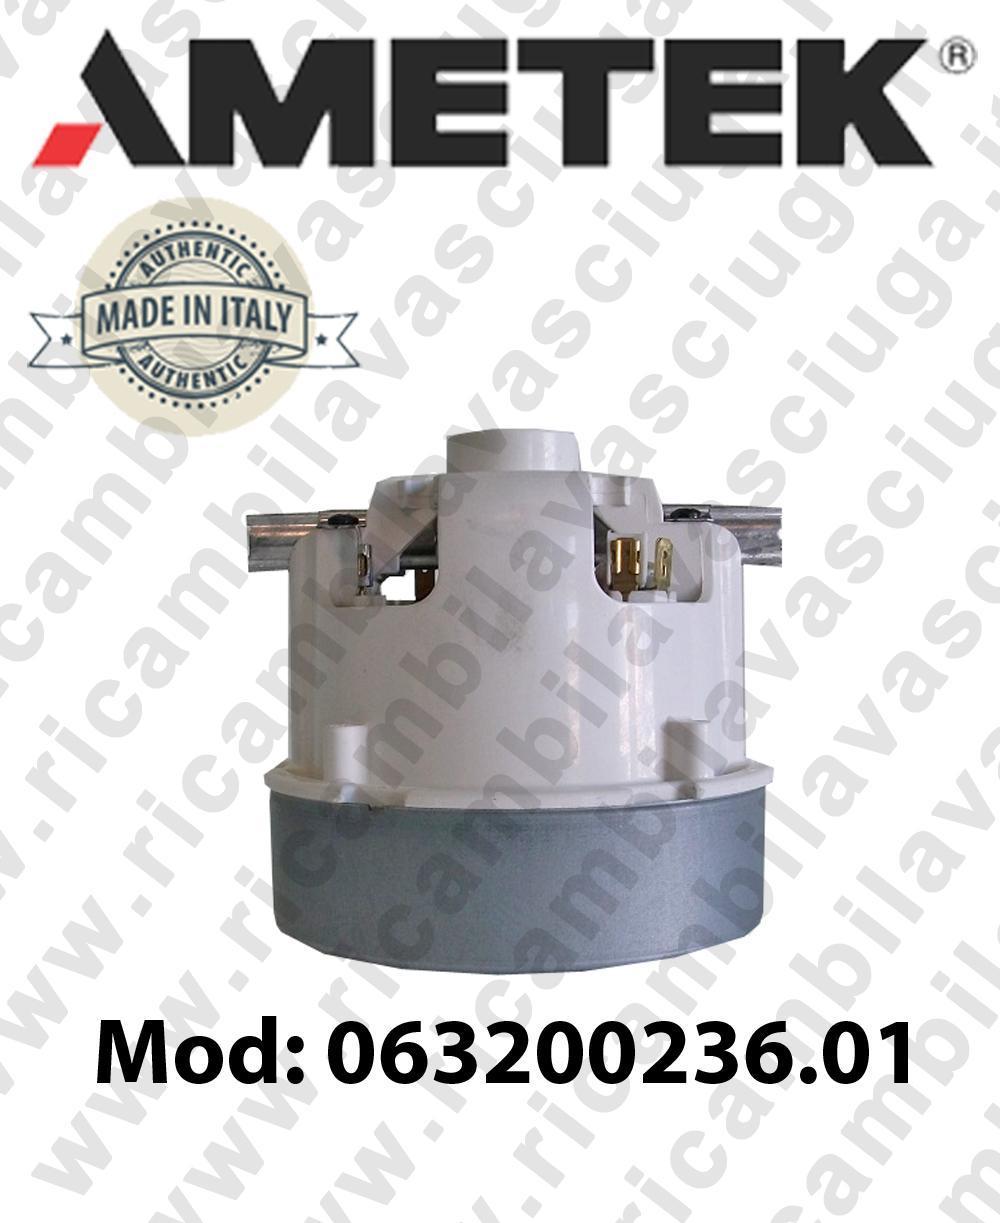 Vacuum motor 063200236 AMETEK ITALIA for vacuum cleaner and scrubber dryer